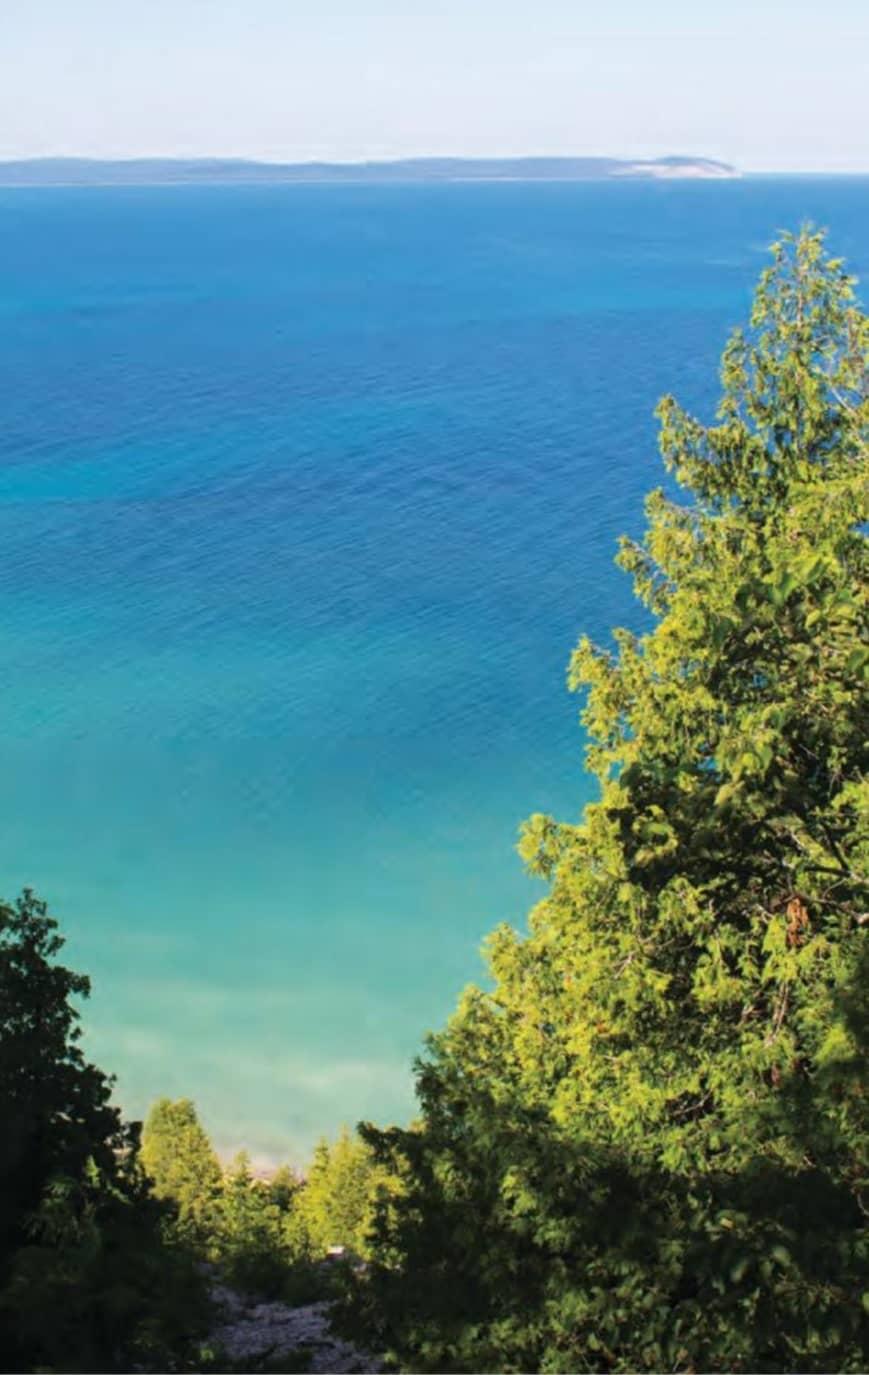 Explore Whaleback Natural Area